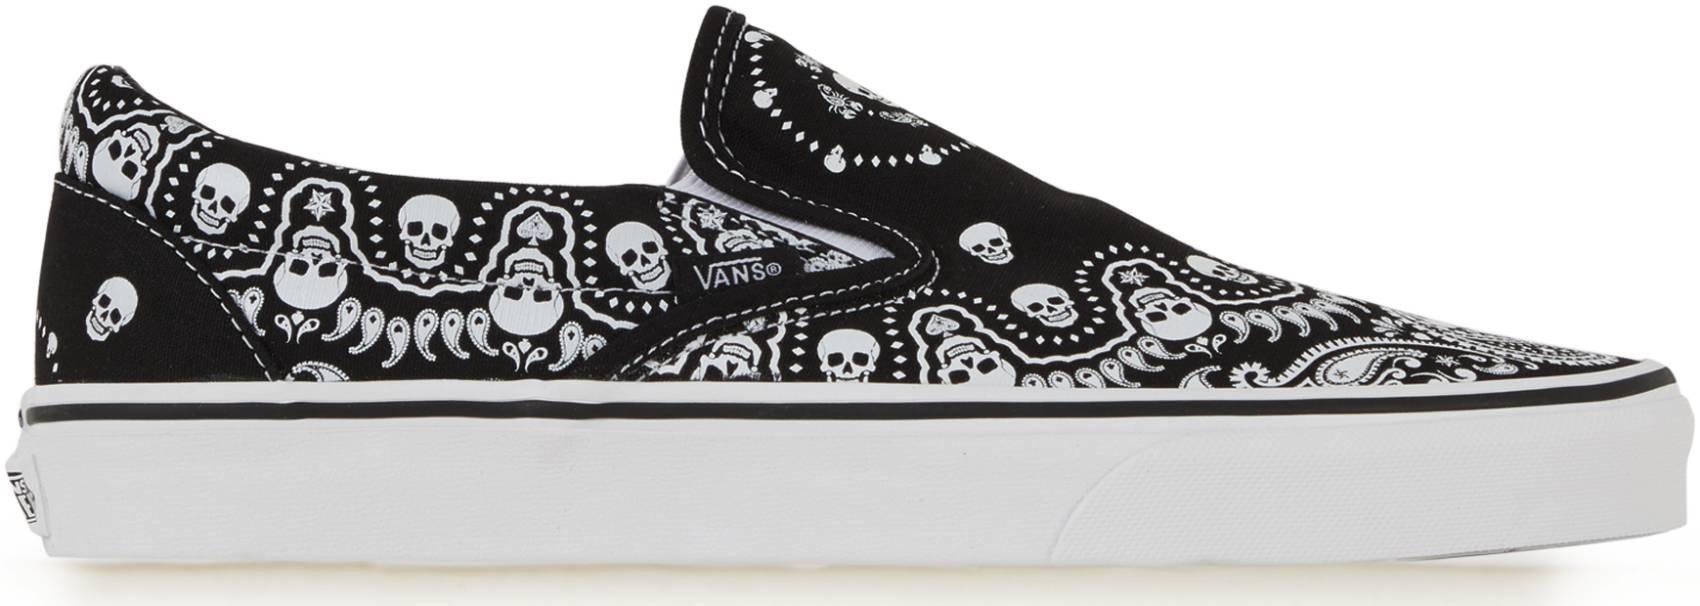 Vans Bandana Classic Slip-On sneakers | RunRepeat